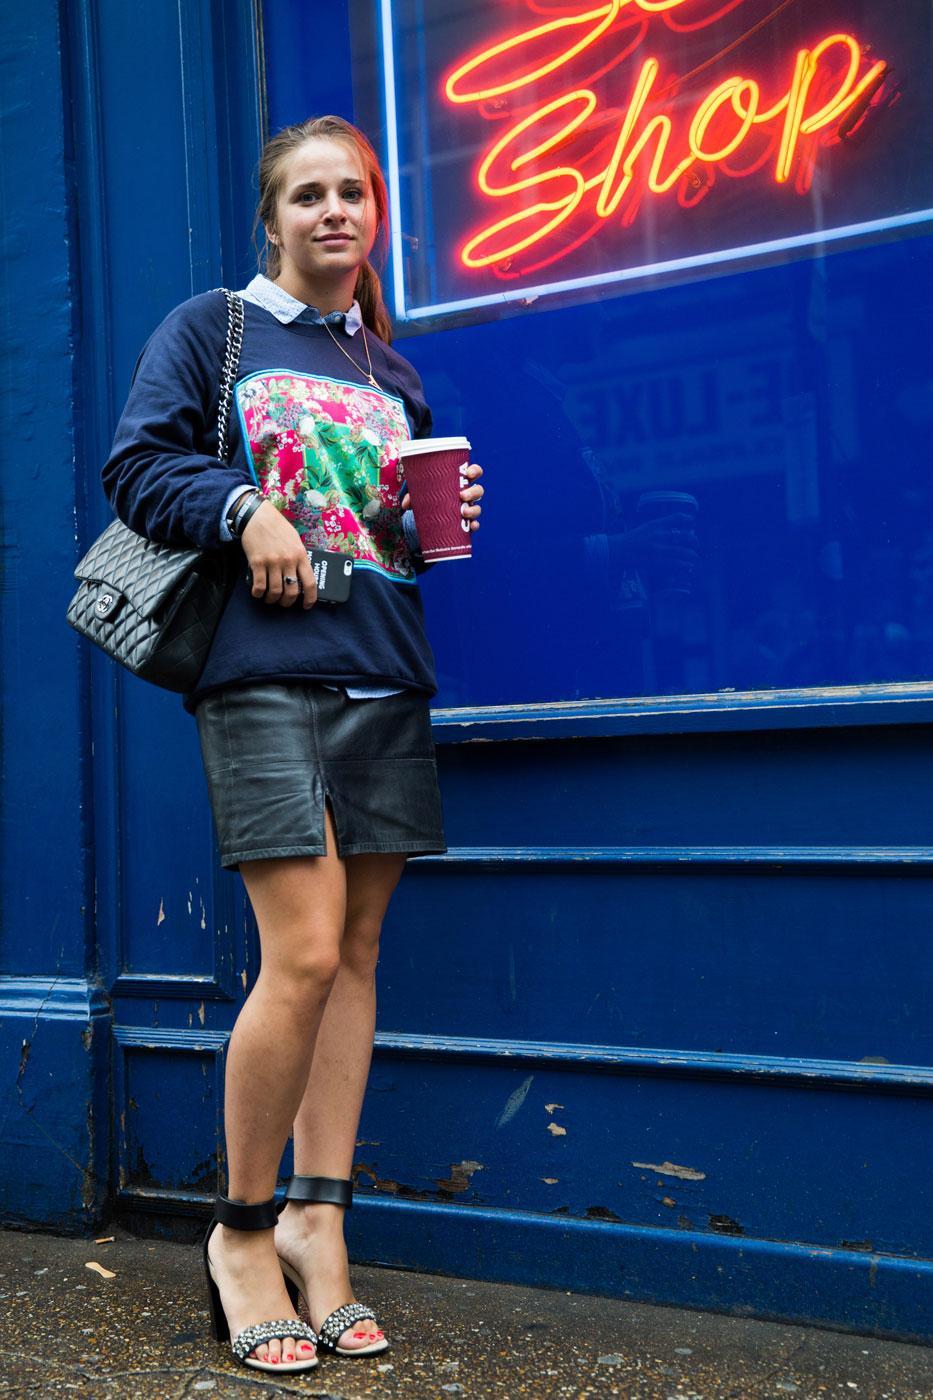 Samantha cameron l pouse de l ex premier ministre Style fashion week in la